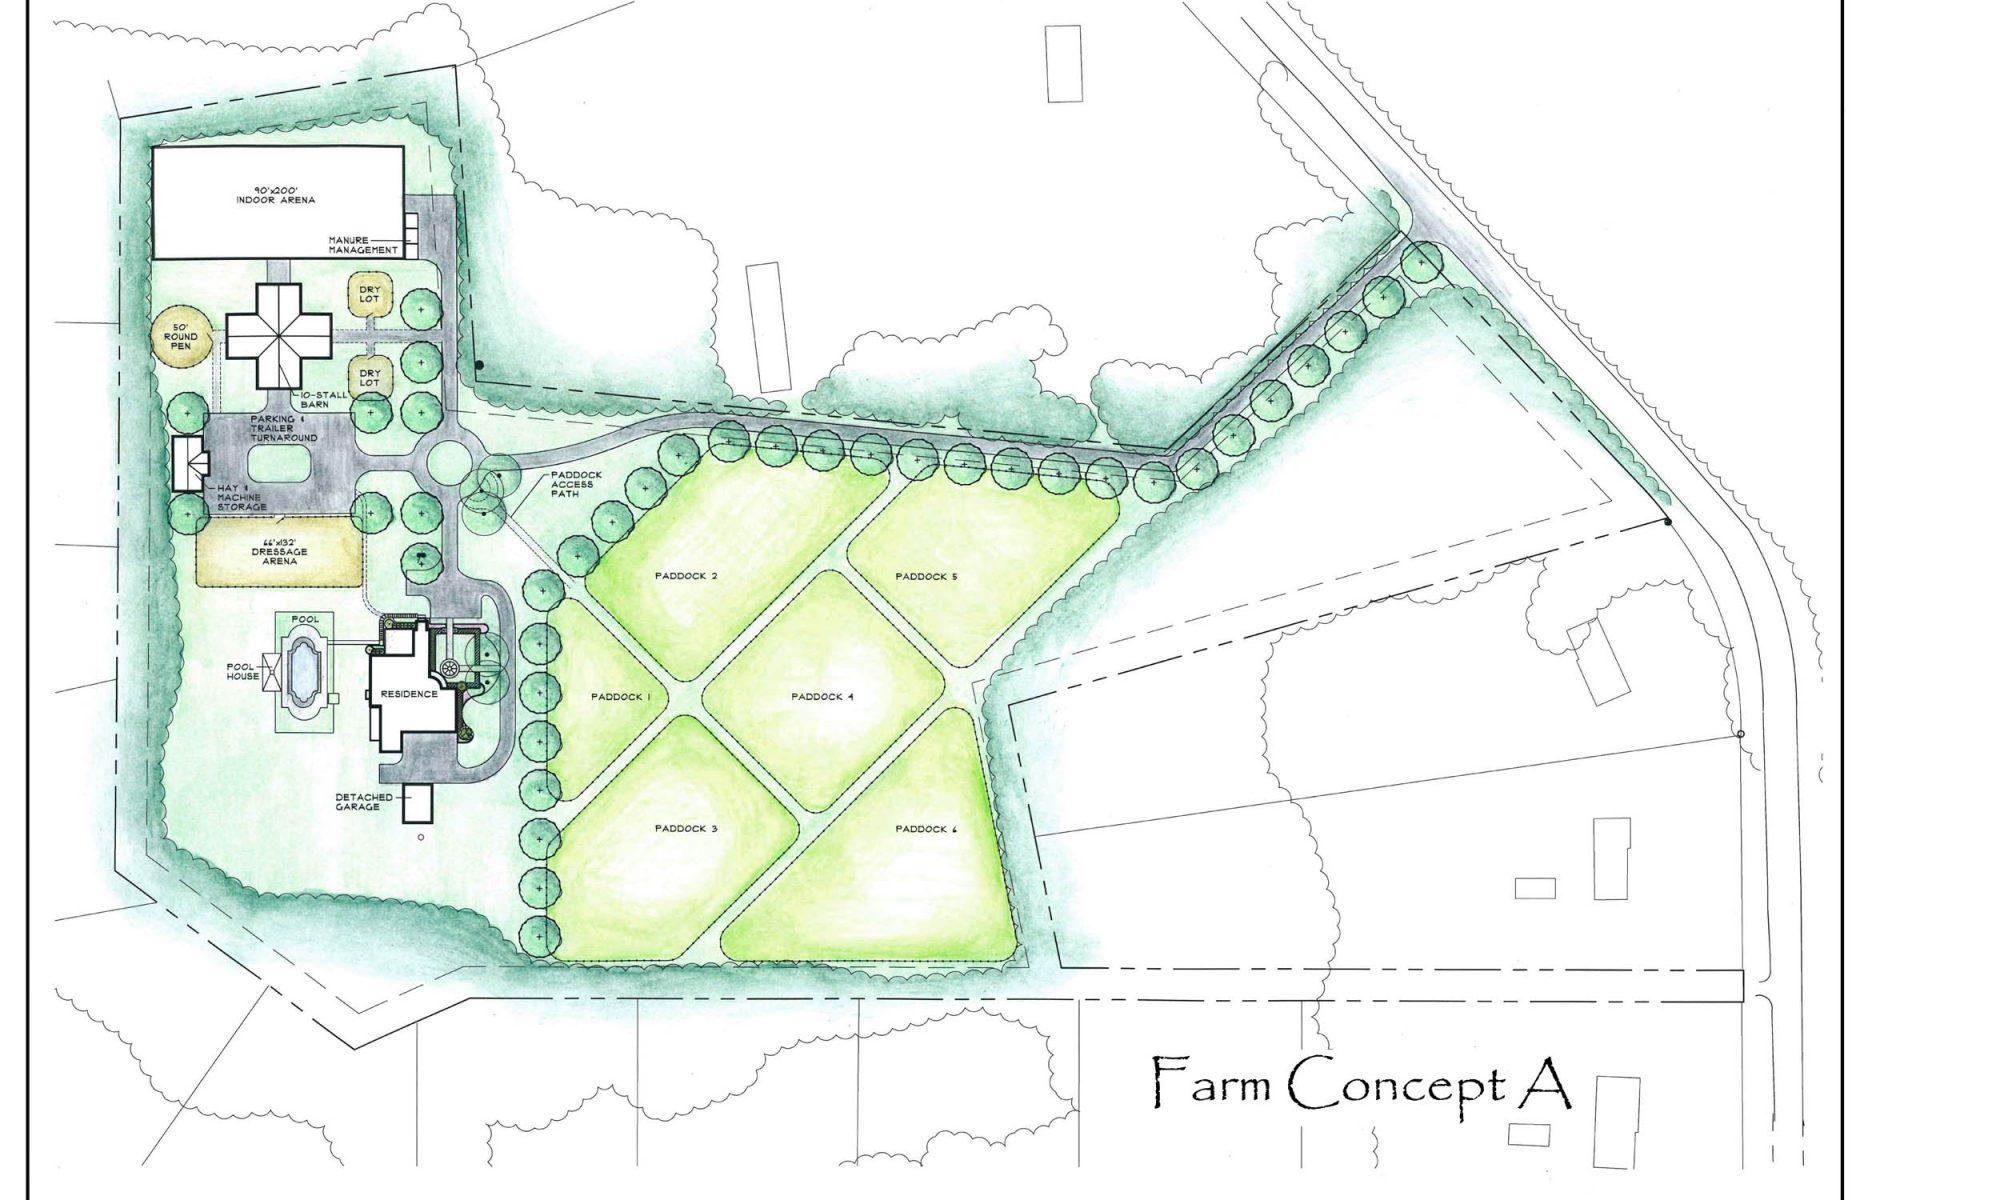 Equestrian Farm Concept A